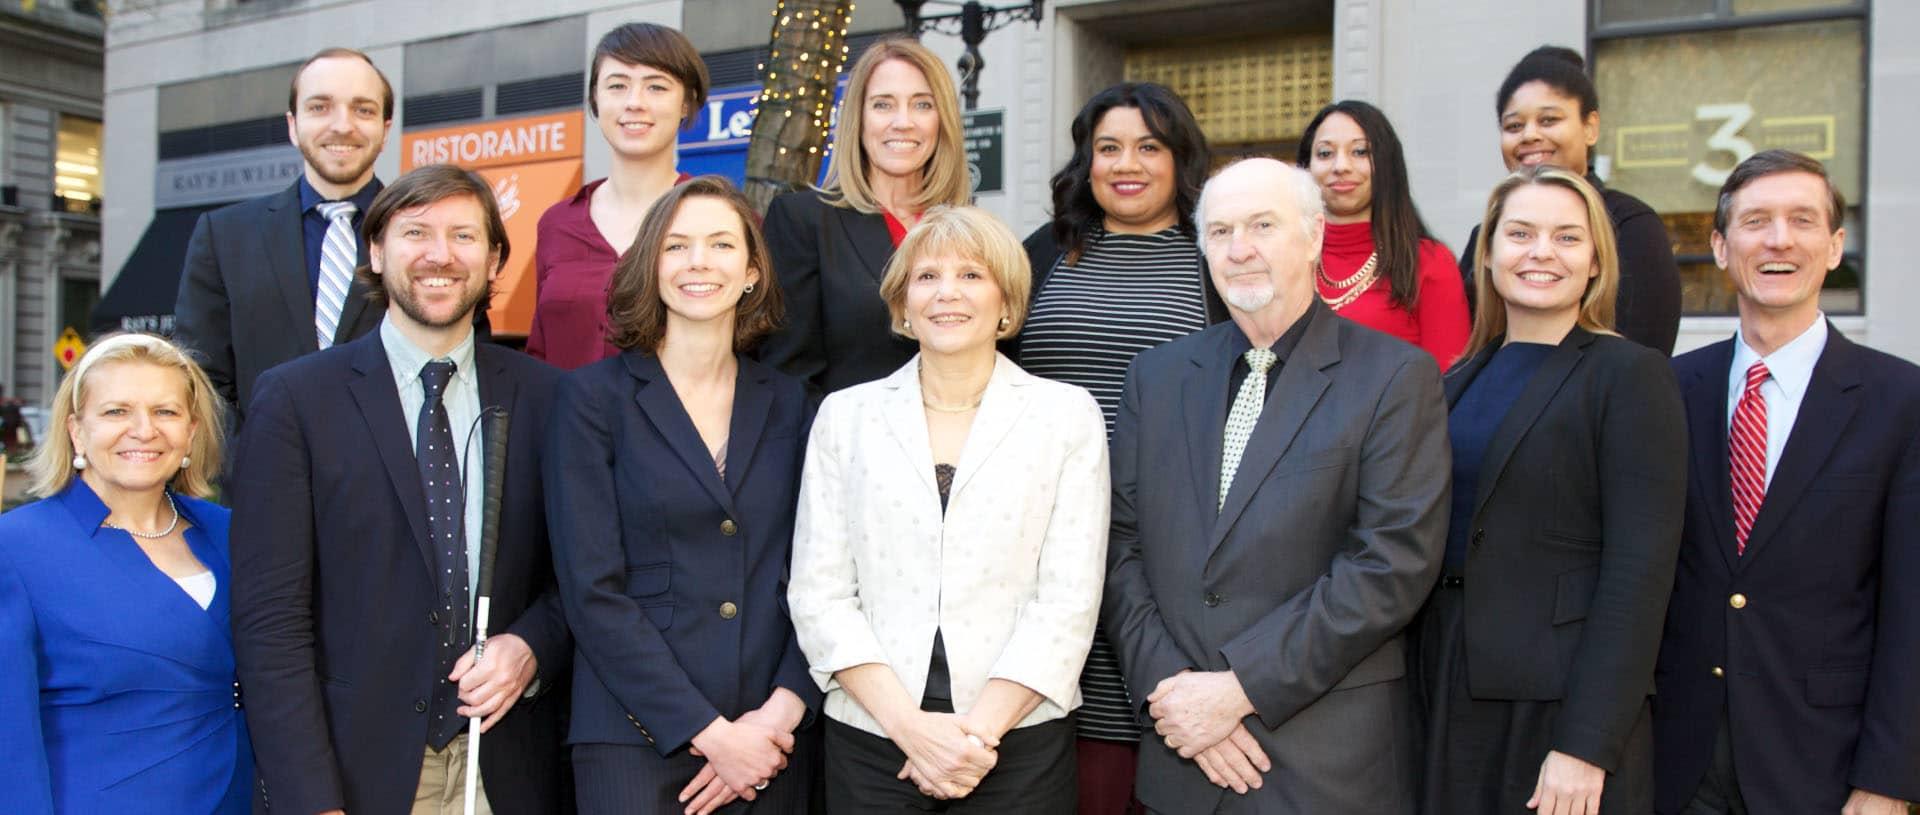 Group photo of NOD staff members